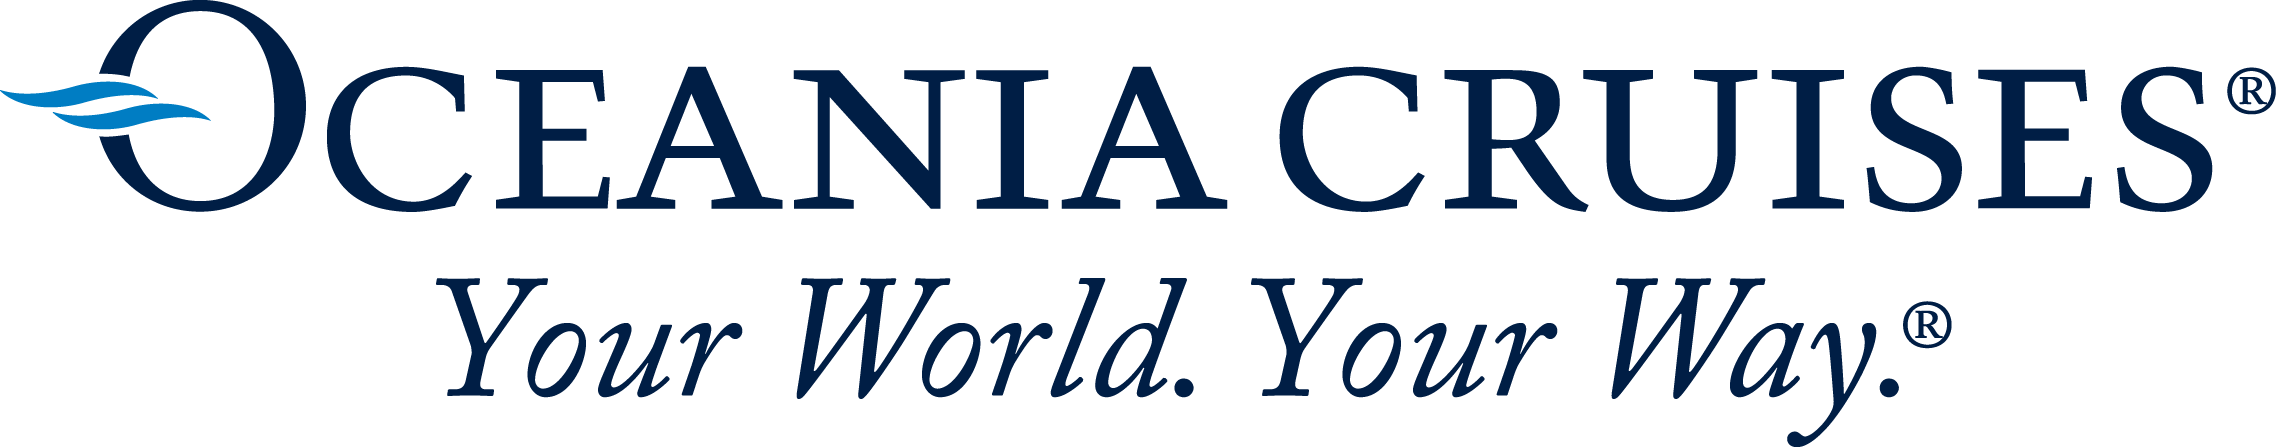 Oceania Cruises Logo png